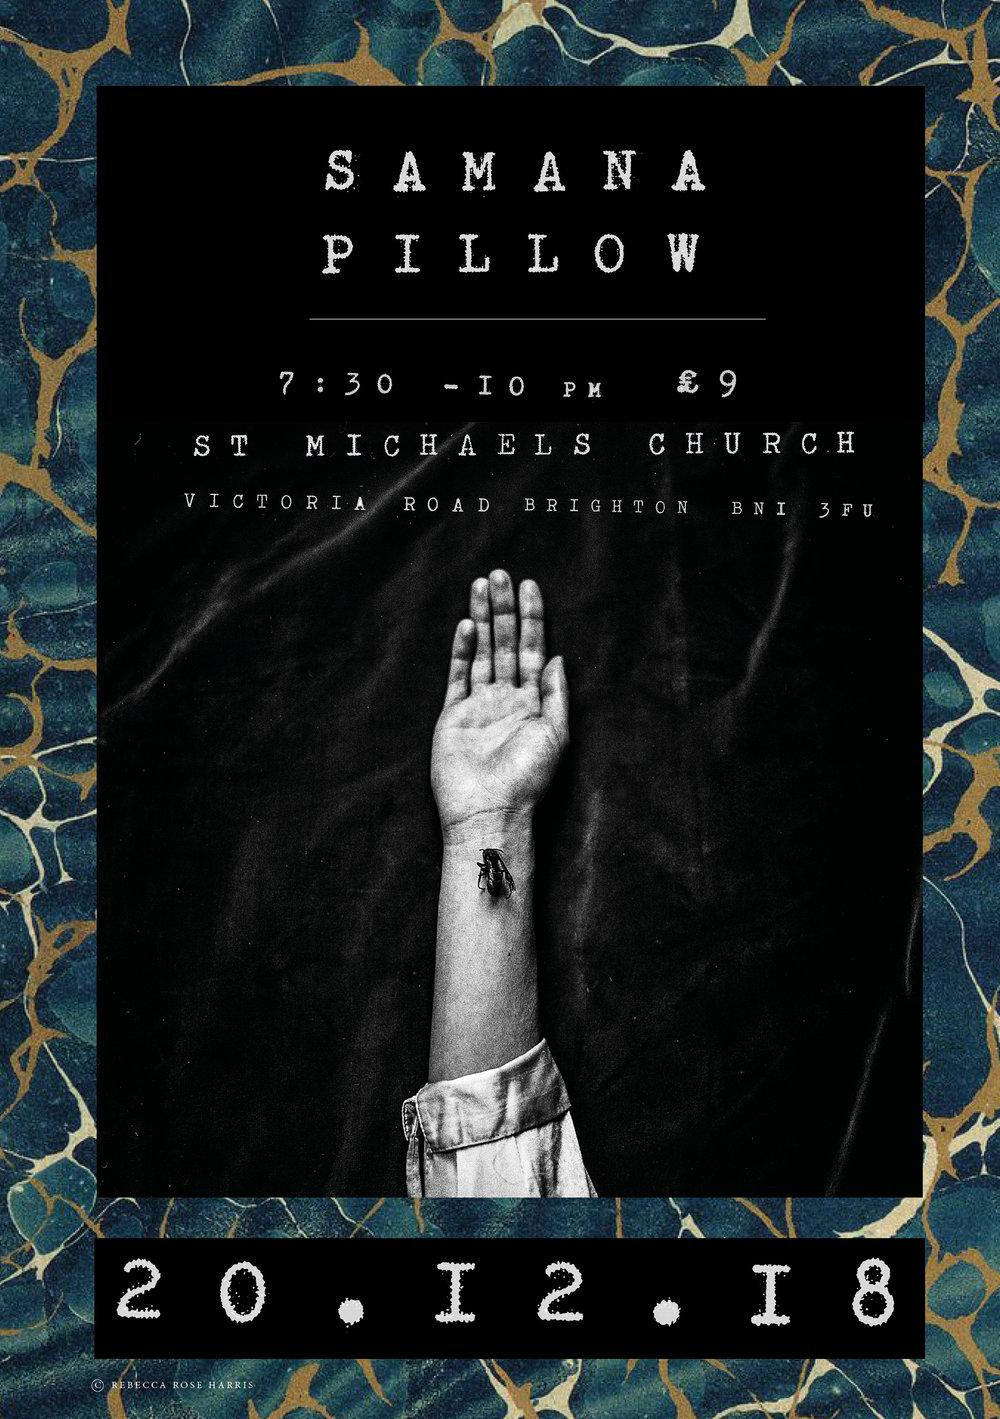 Samana + Pillow Gig - Samana